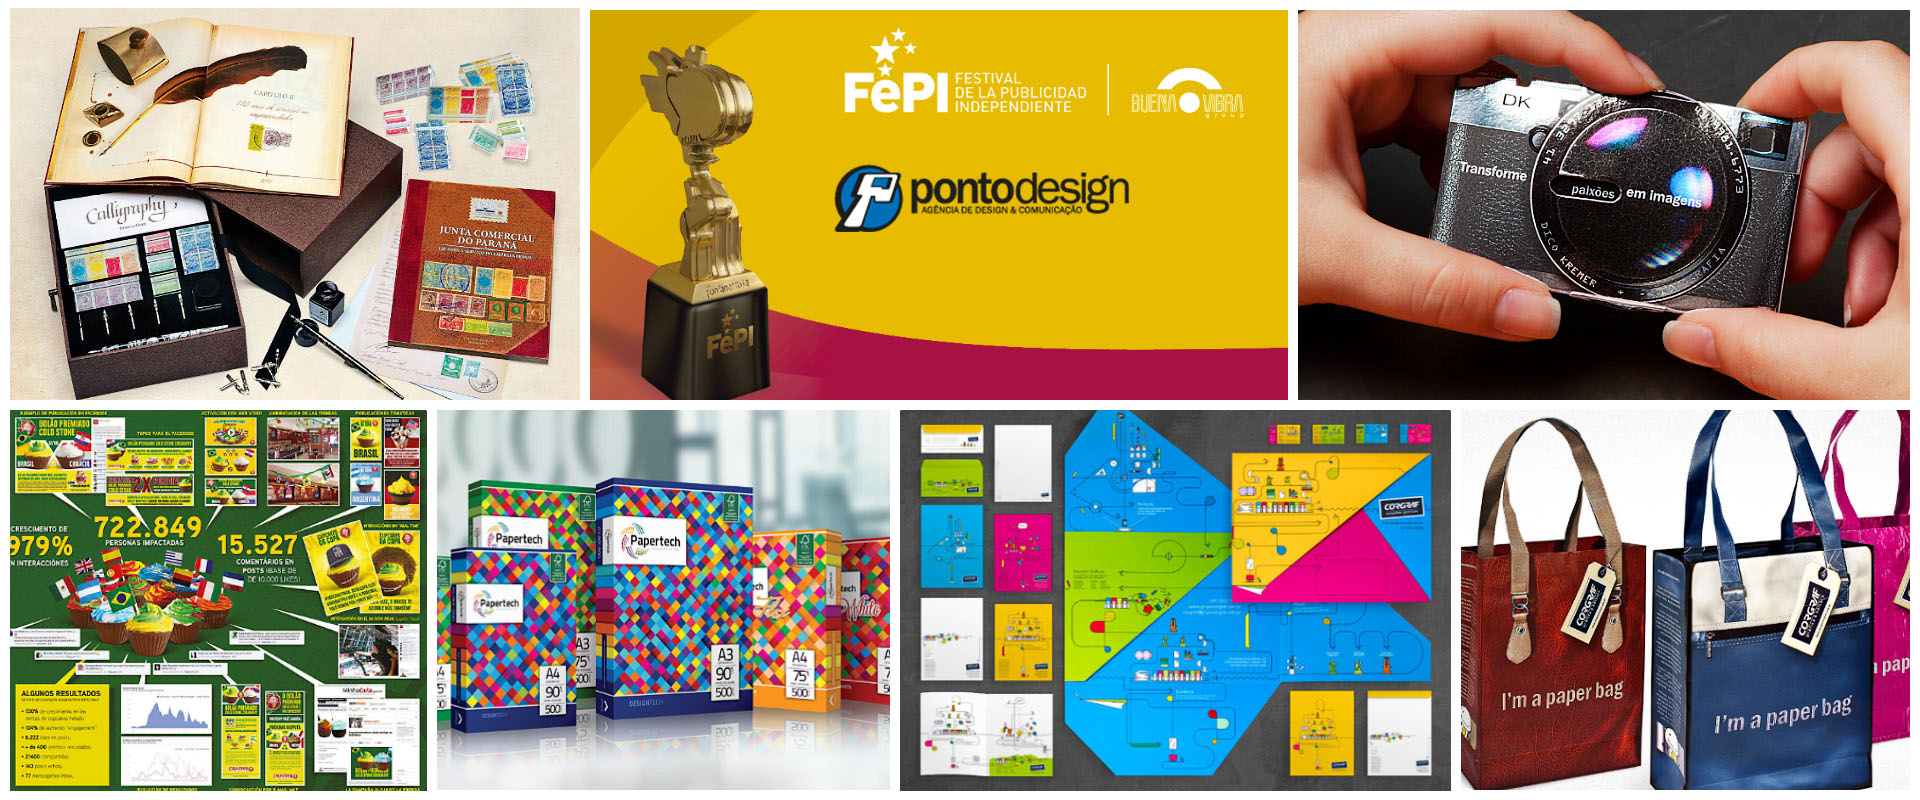 Pontodesign Prêmio Fepi